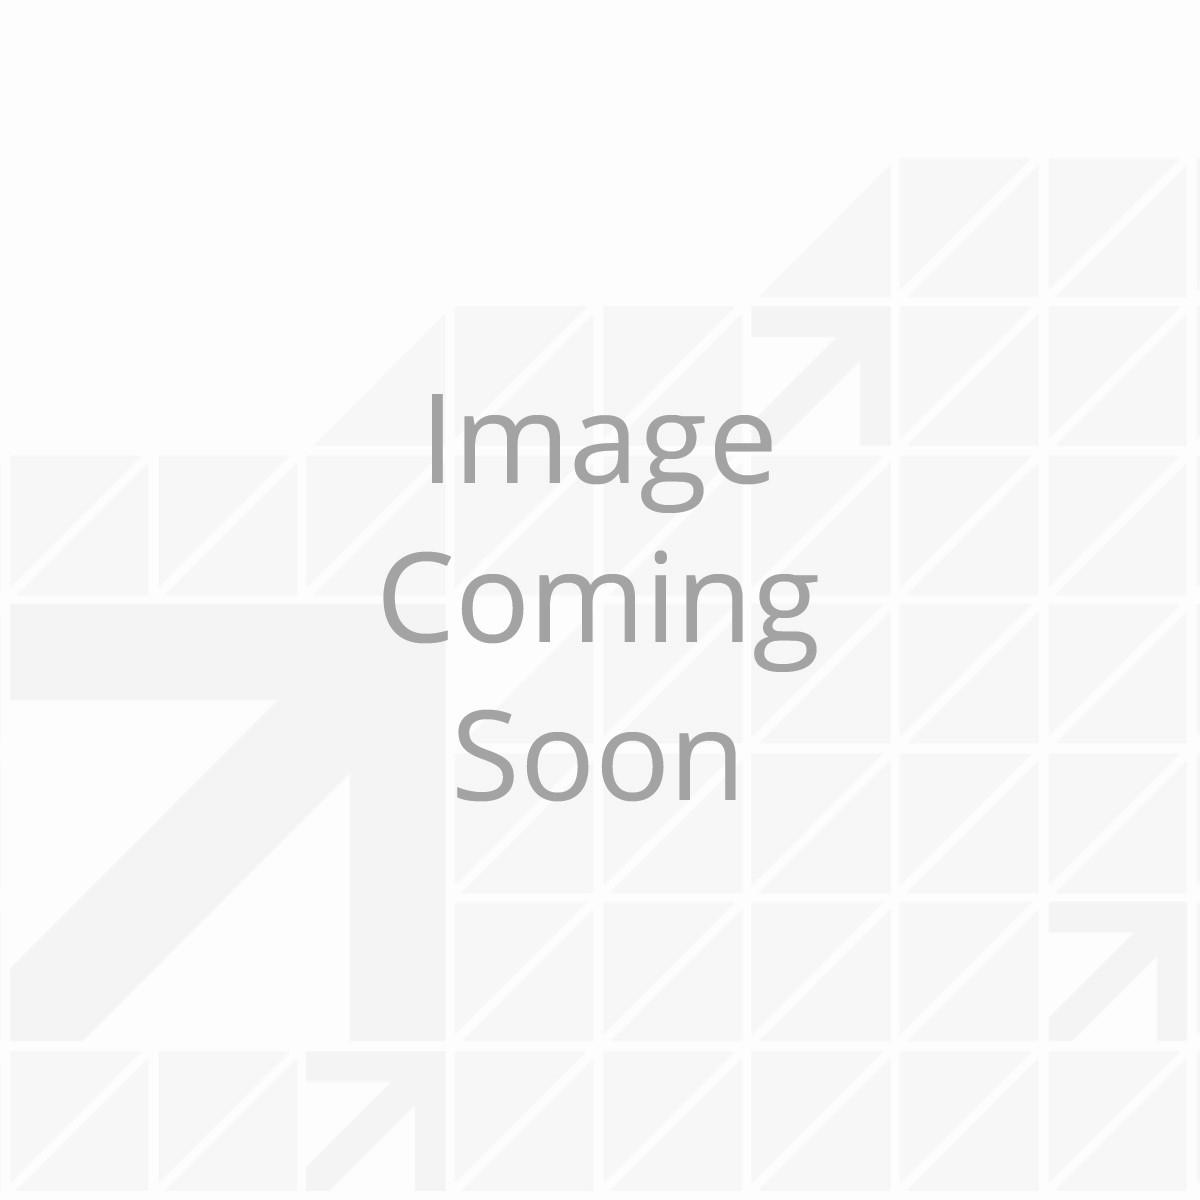 B10-3543; Support-Holding Tank X 68 1/4 - B